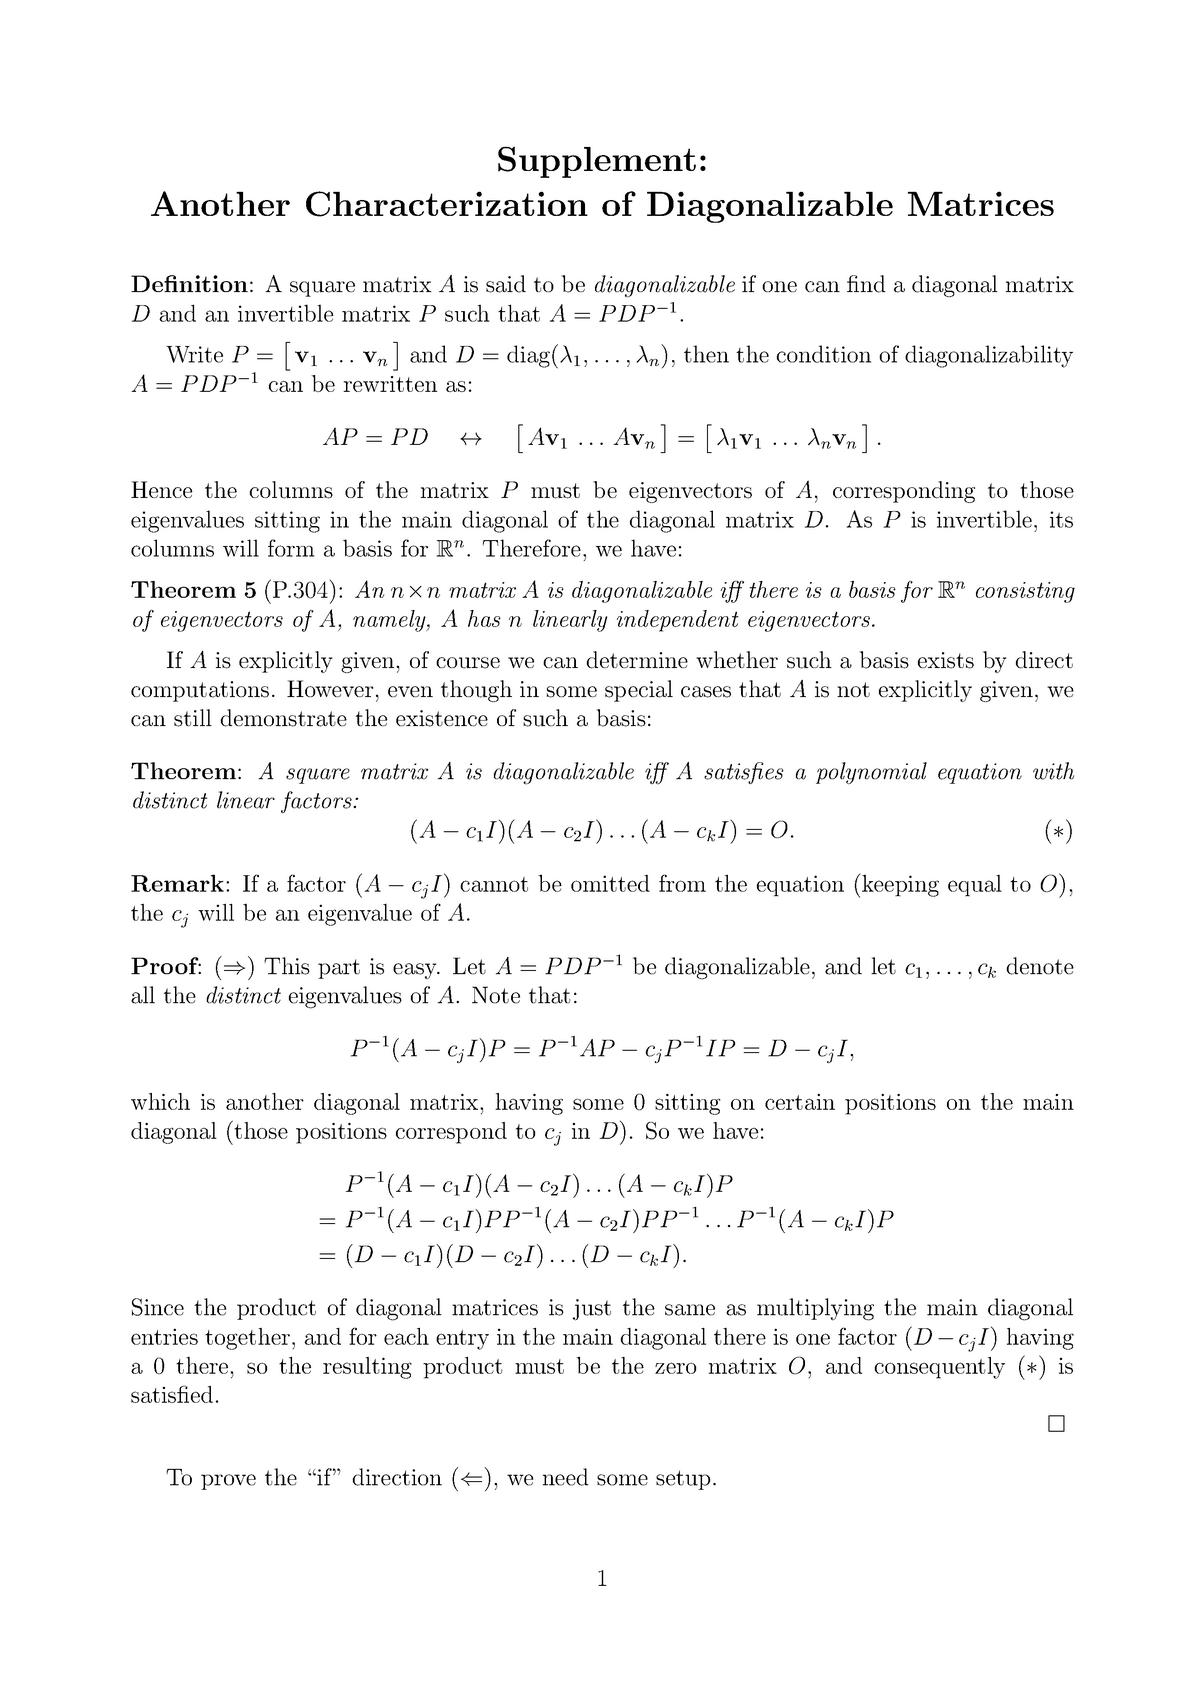 05 diag - Lee, Wing Lung - MATH 2111: Matrix Algebra and